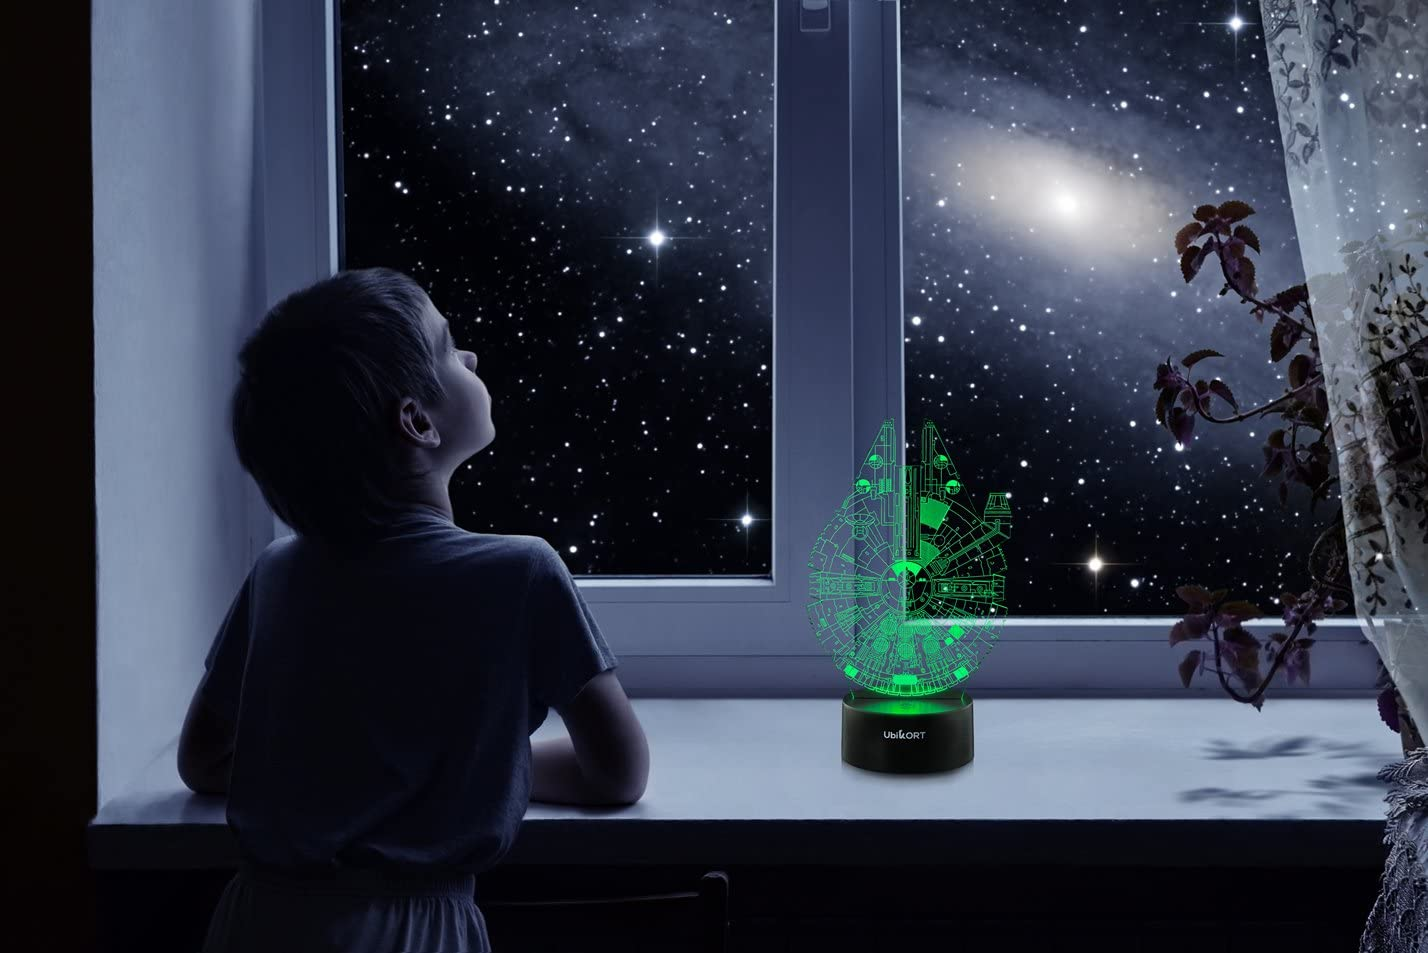 2. UbiKORT 3D Millennium Falcon Night Light